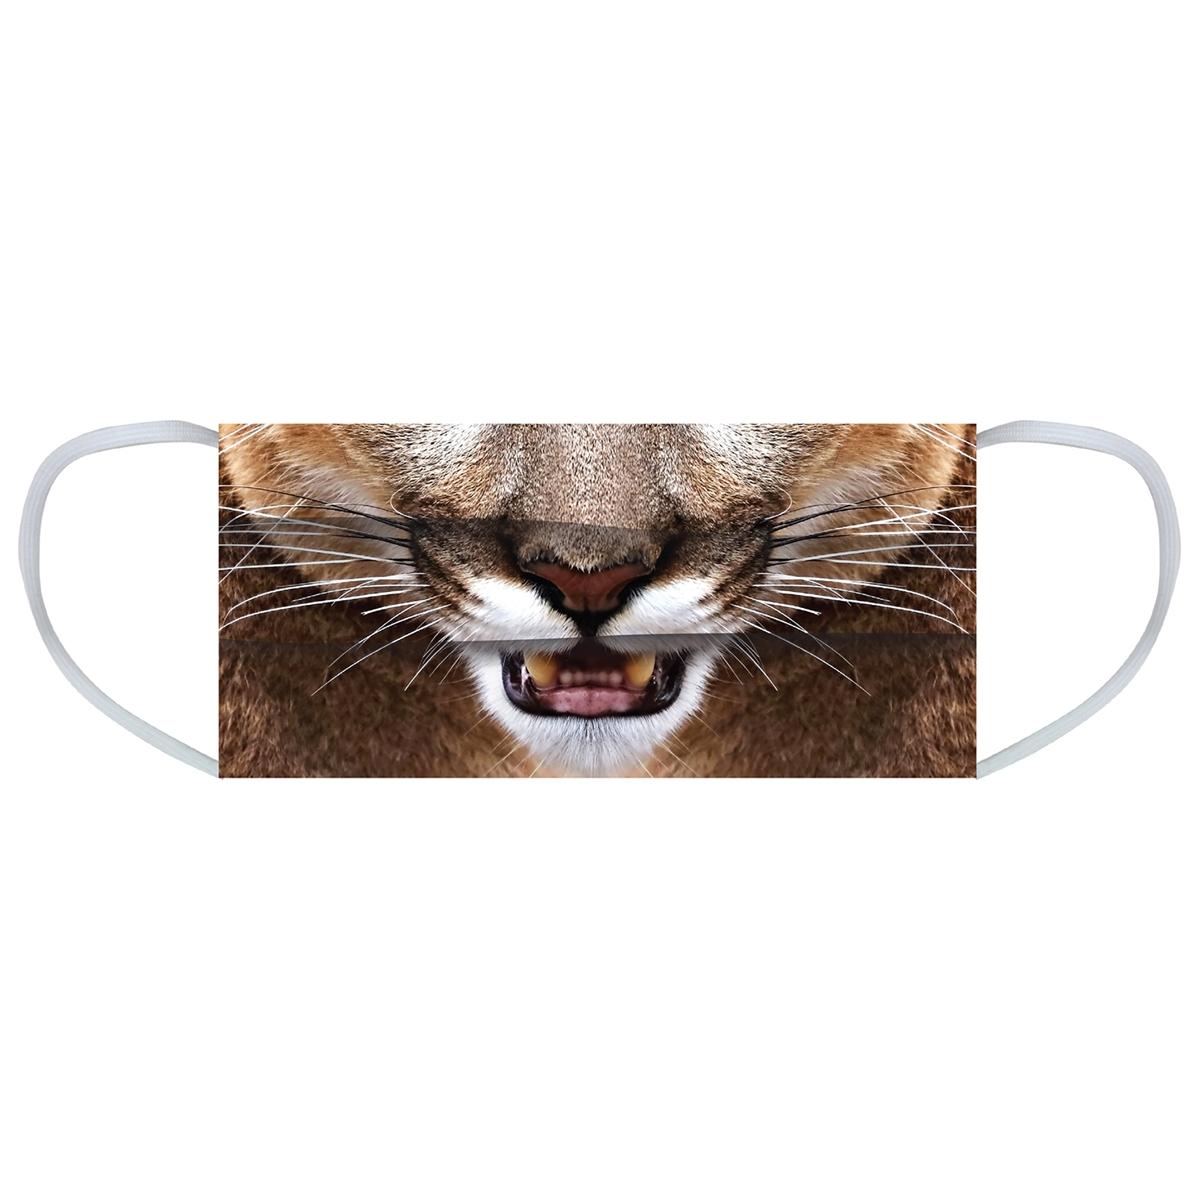 Cougar Face Mask